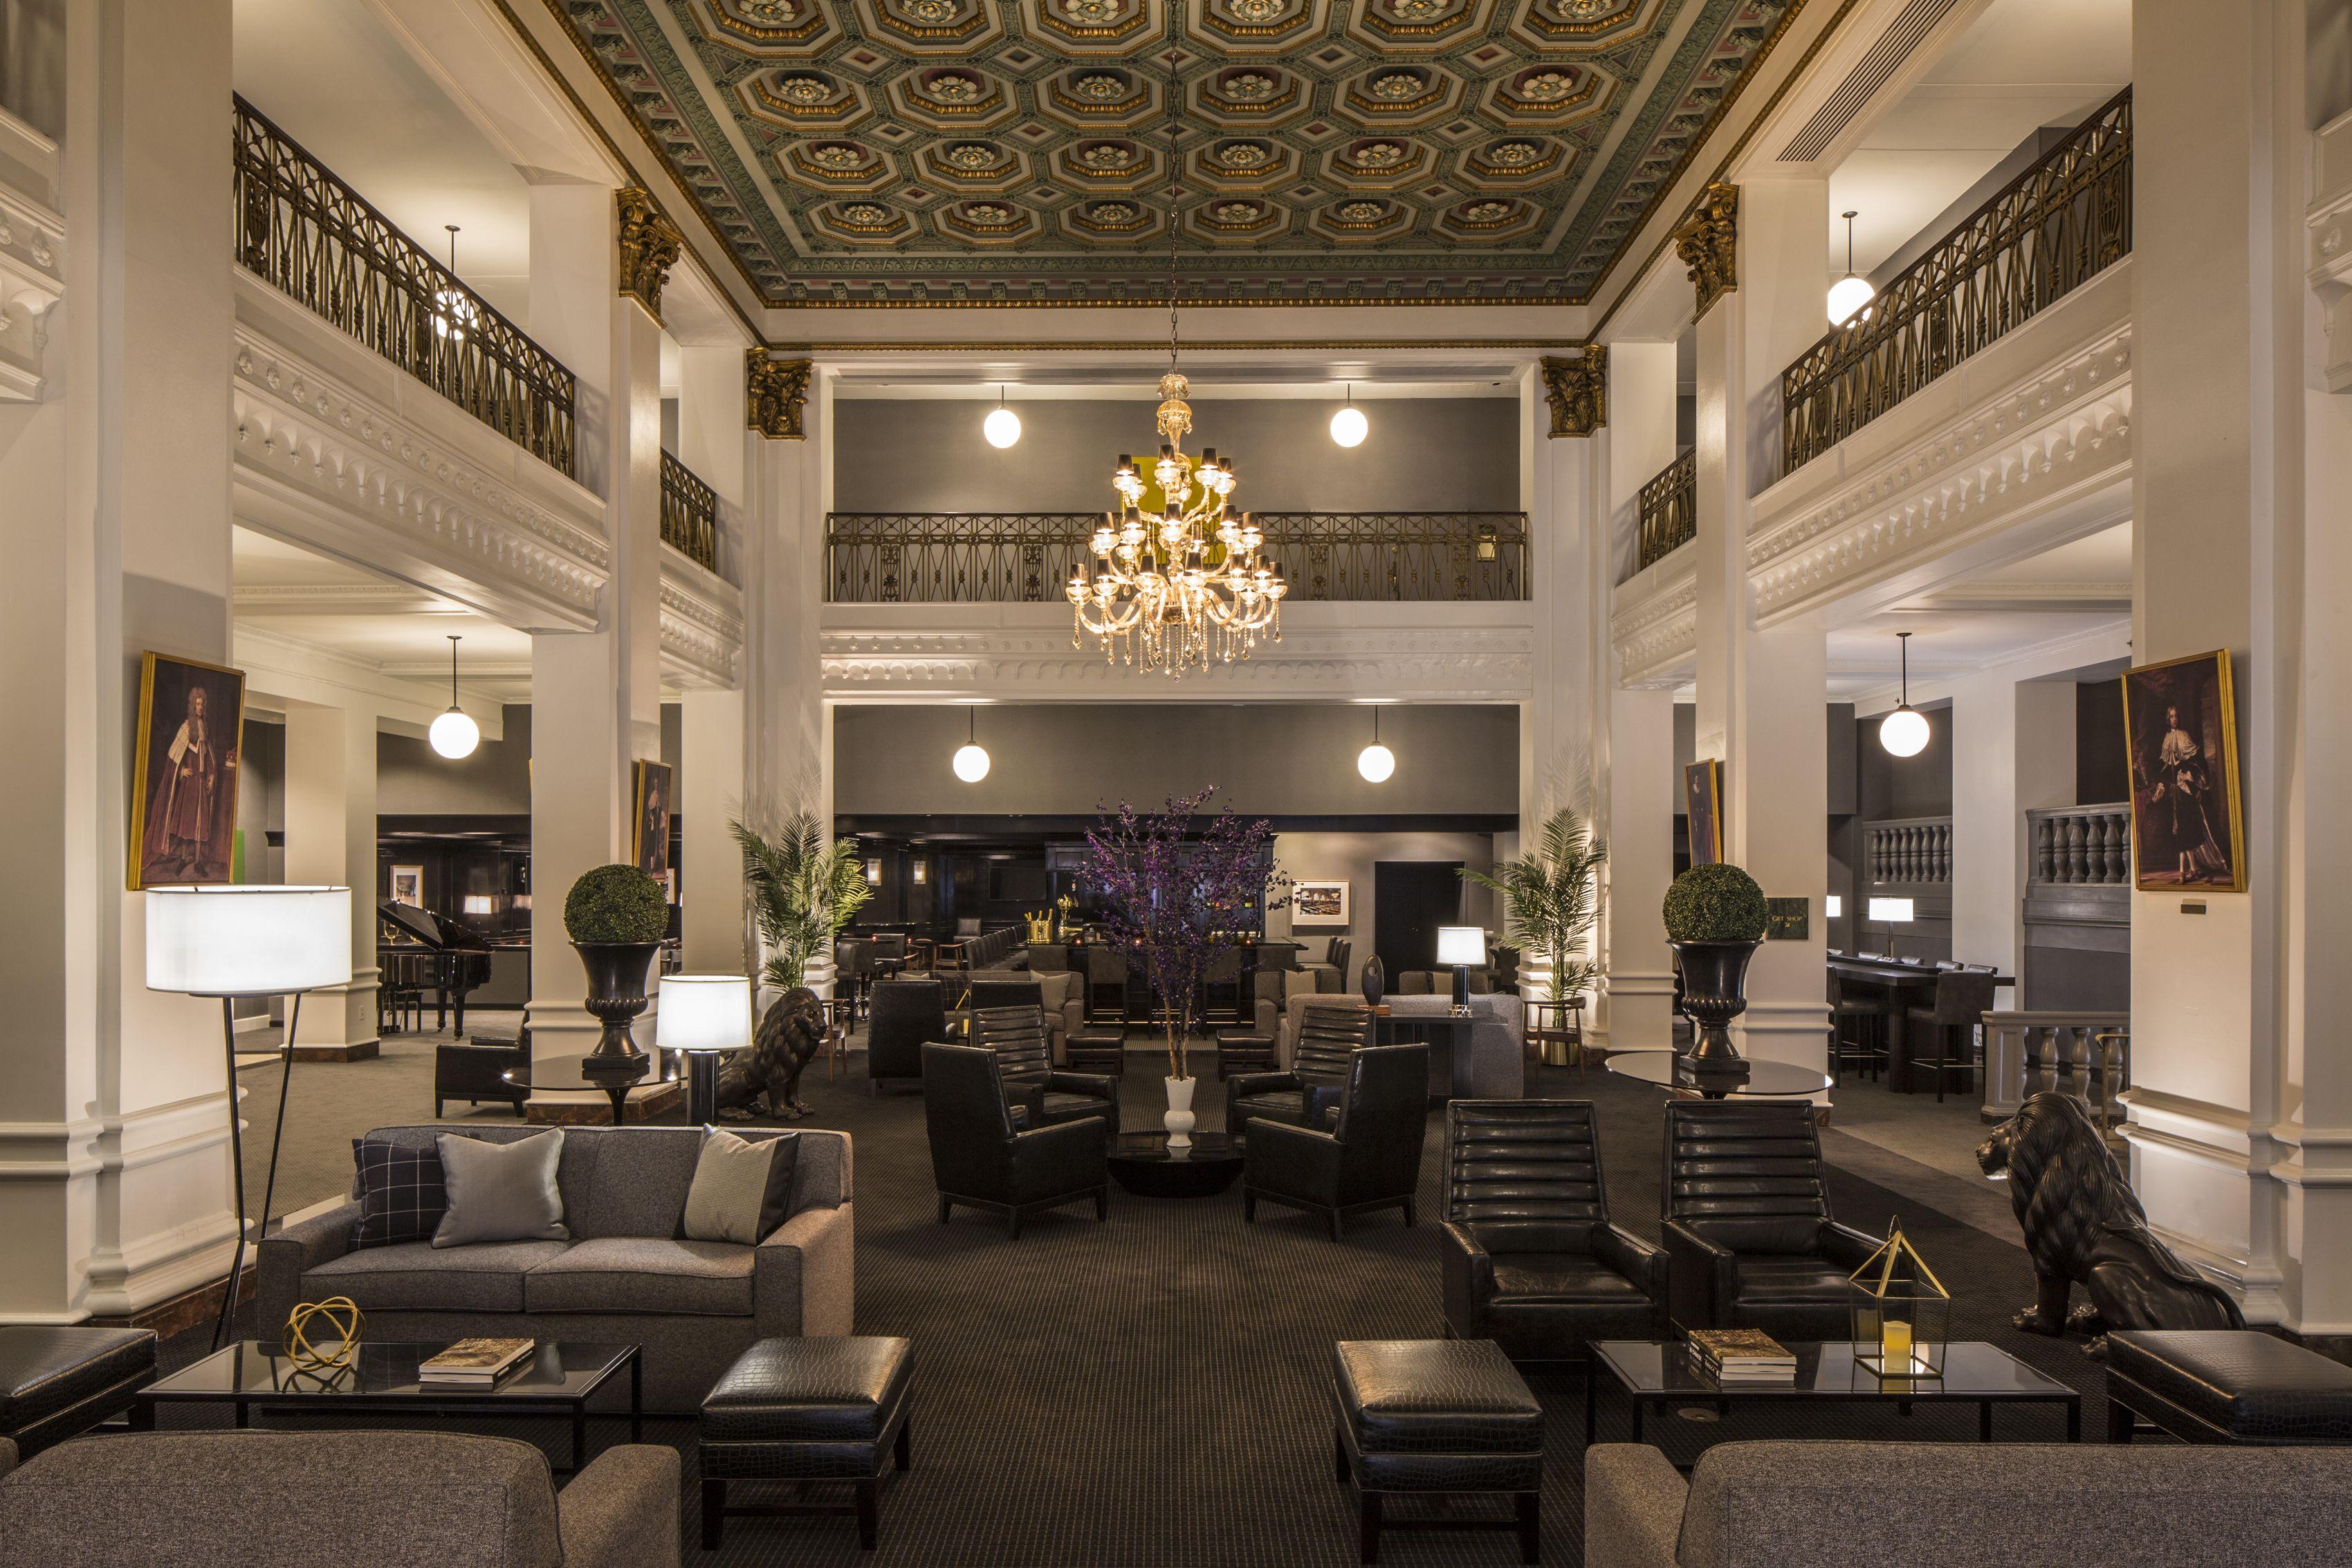 Hotel lobby furniture - Hotel Lobby Furniture 46